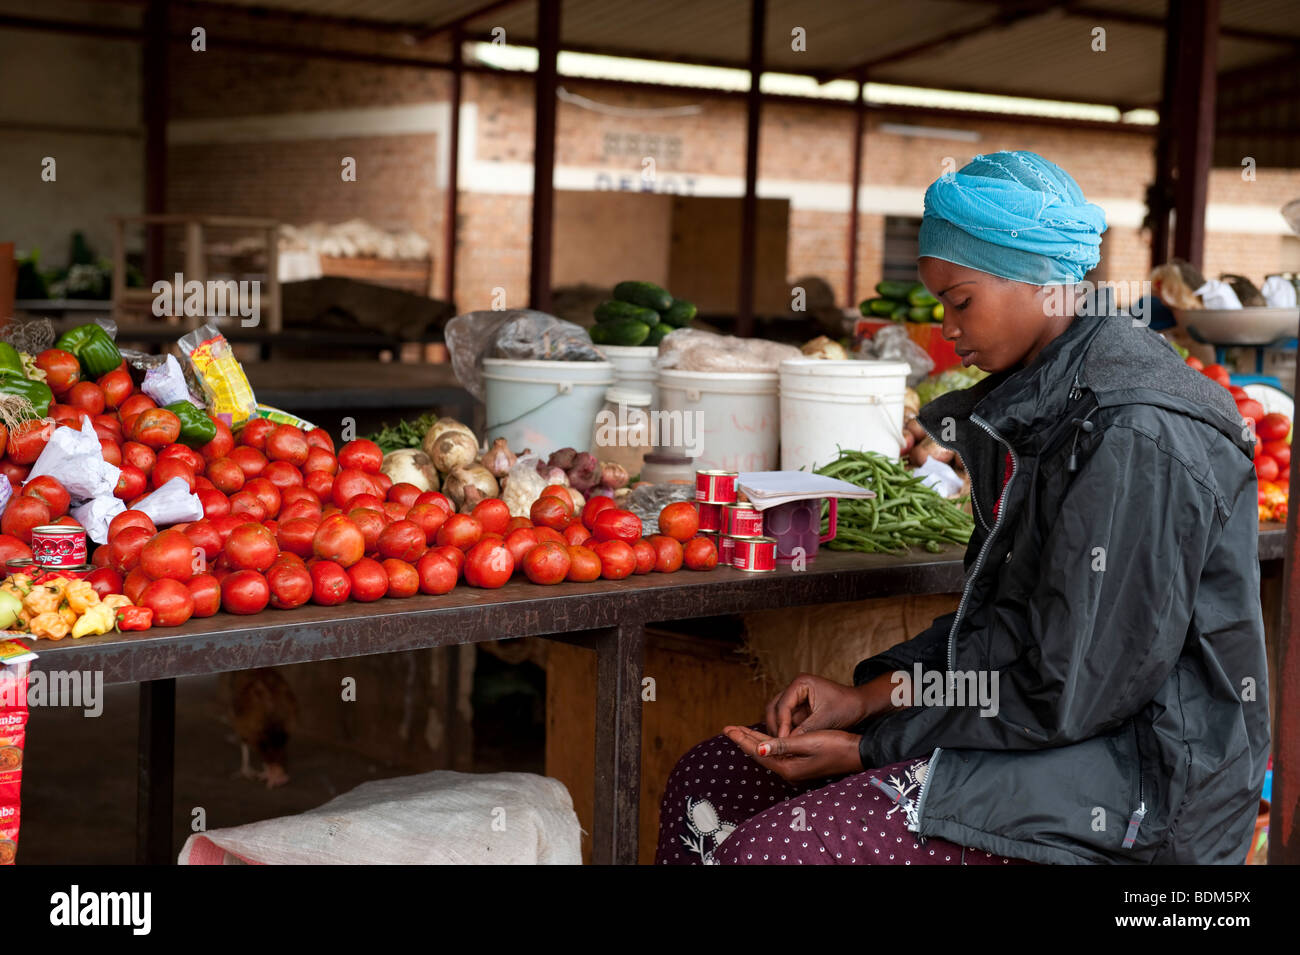 market, Kigali, Rwanda - Stock Image